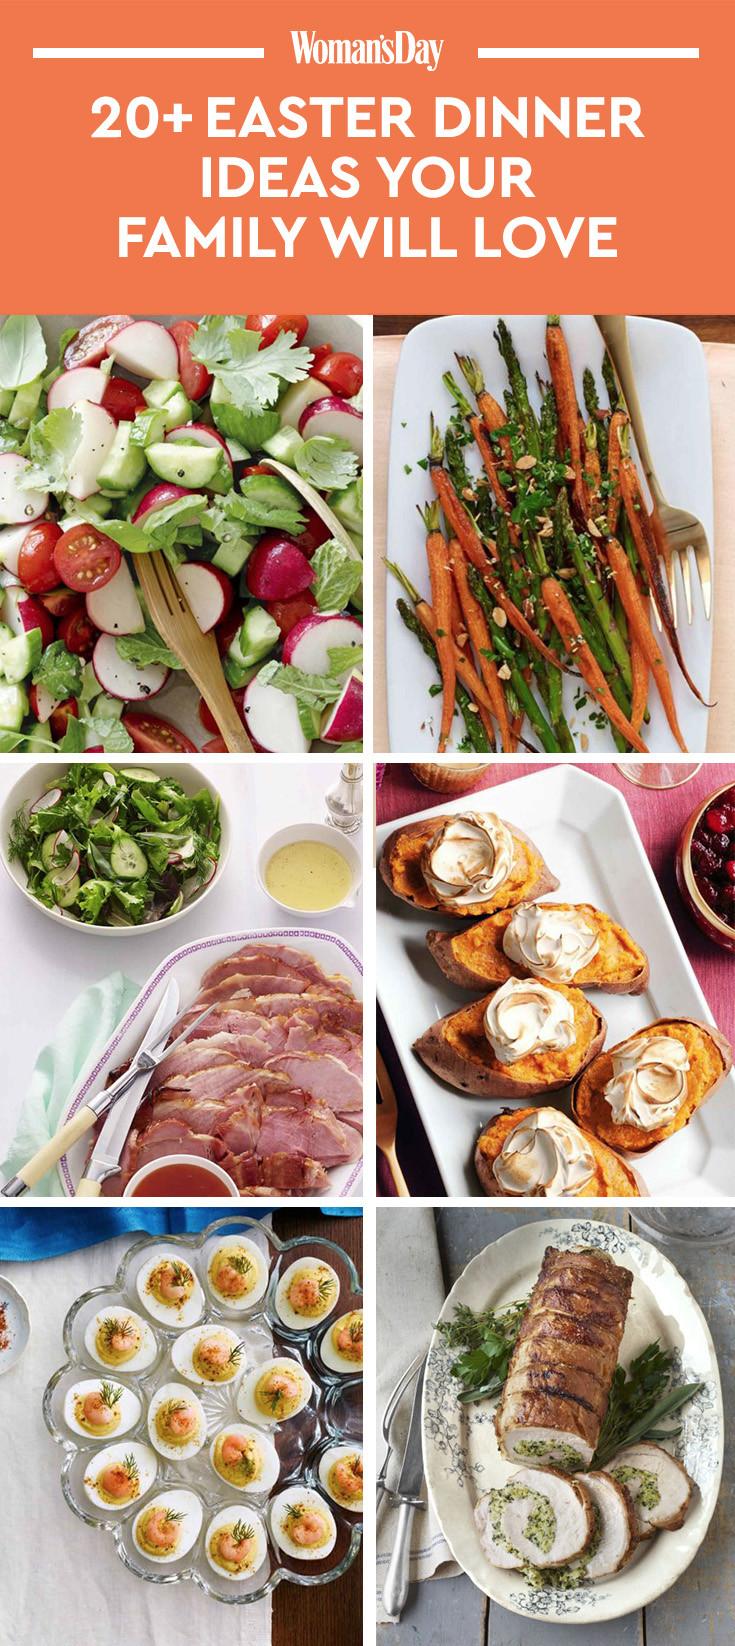 Suggestions For Easter Dinner Menu  21 Easy Easter Dinner Ideas Recipes for the Best Easter